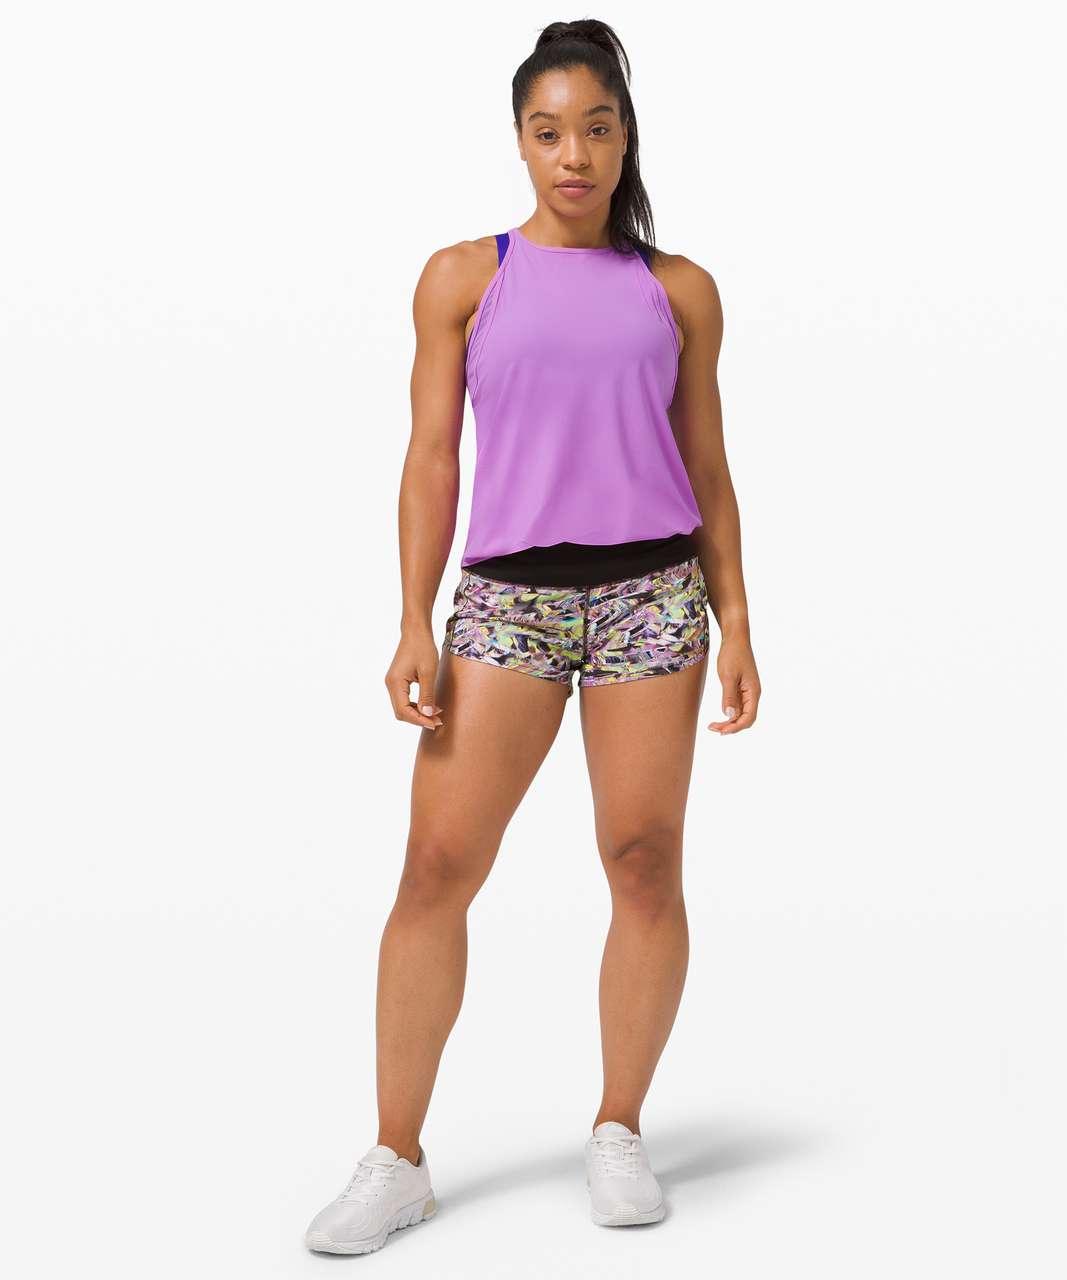 "Lululemon Speed Up Short 2.5"" *SeaWheeze - Super Sonic Alpine White Purple Multi / Black"